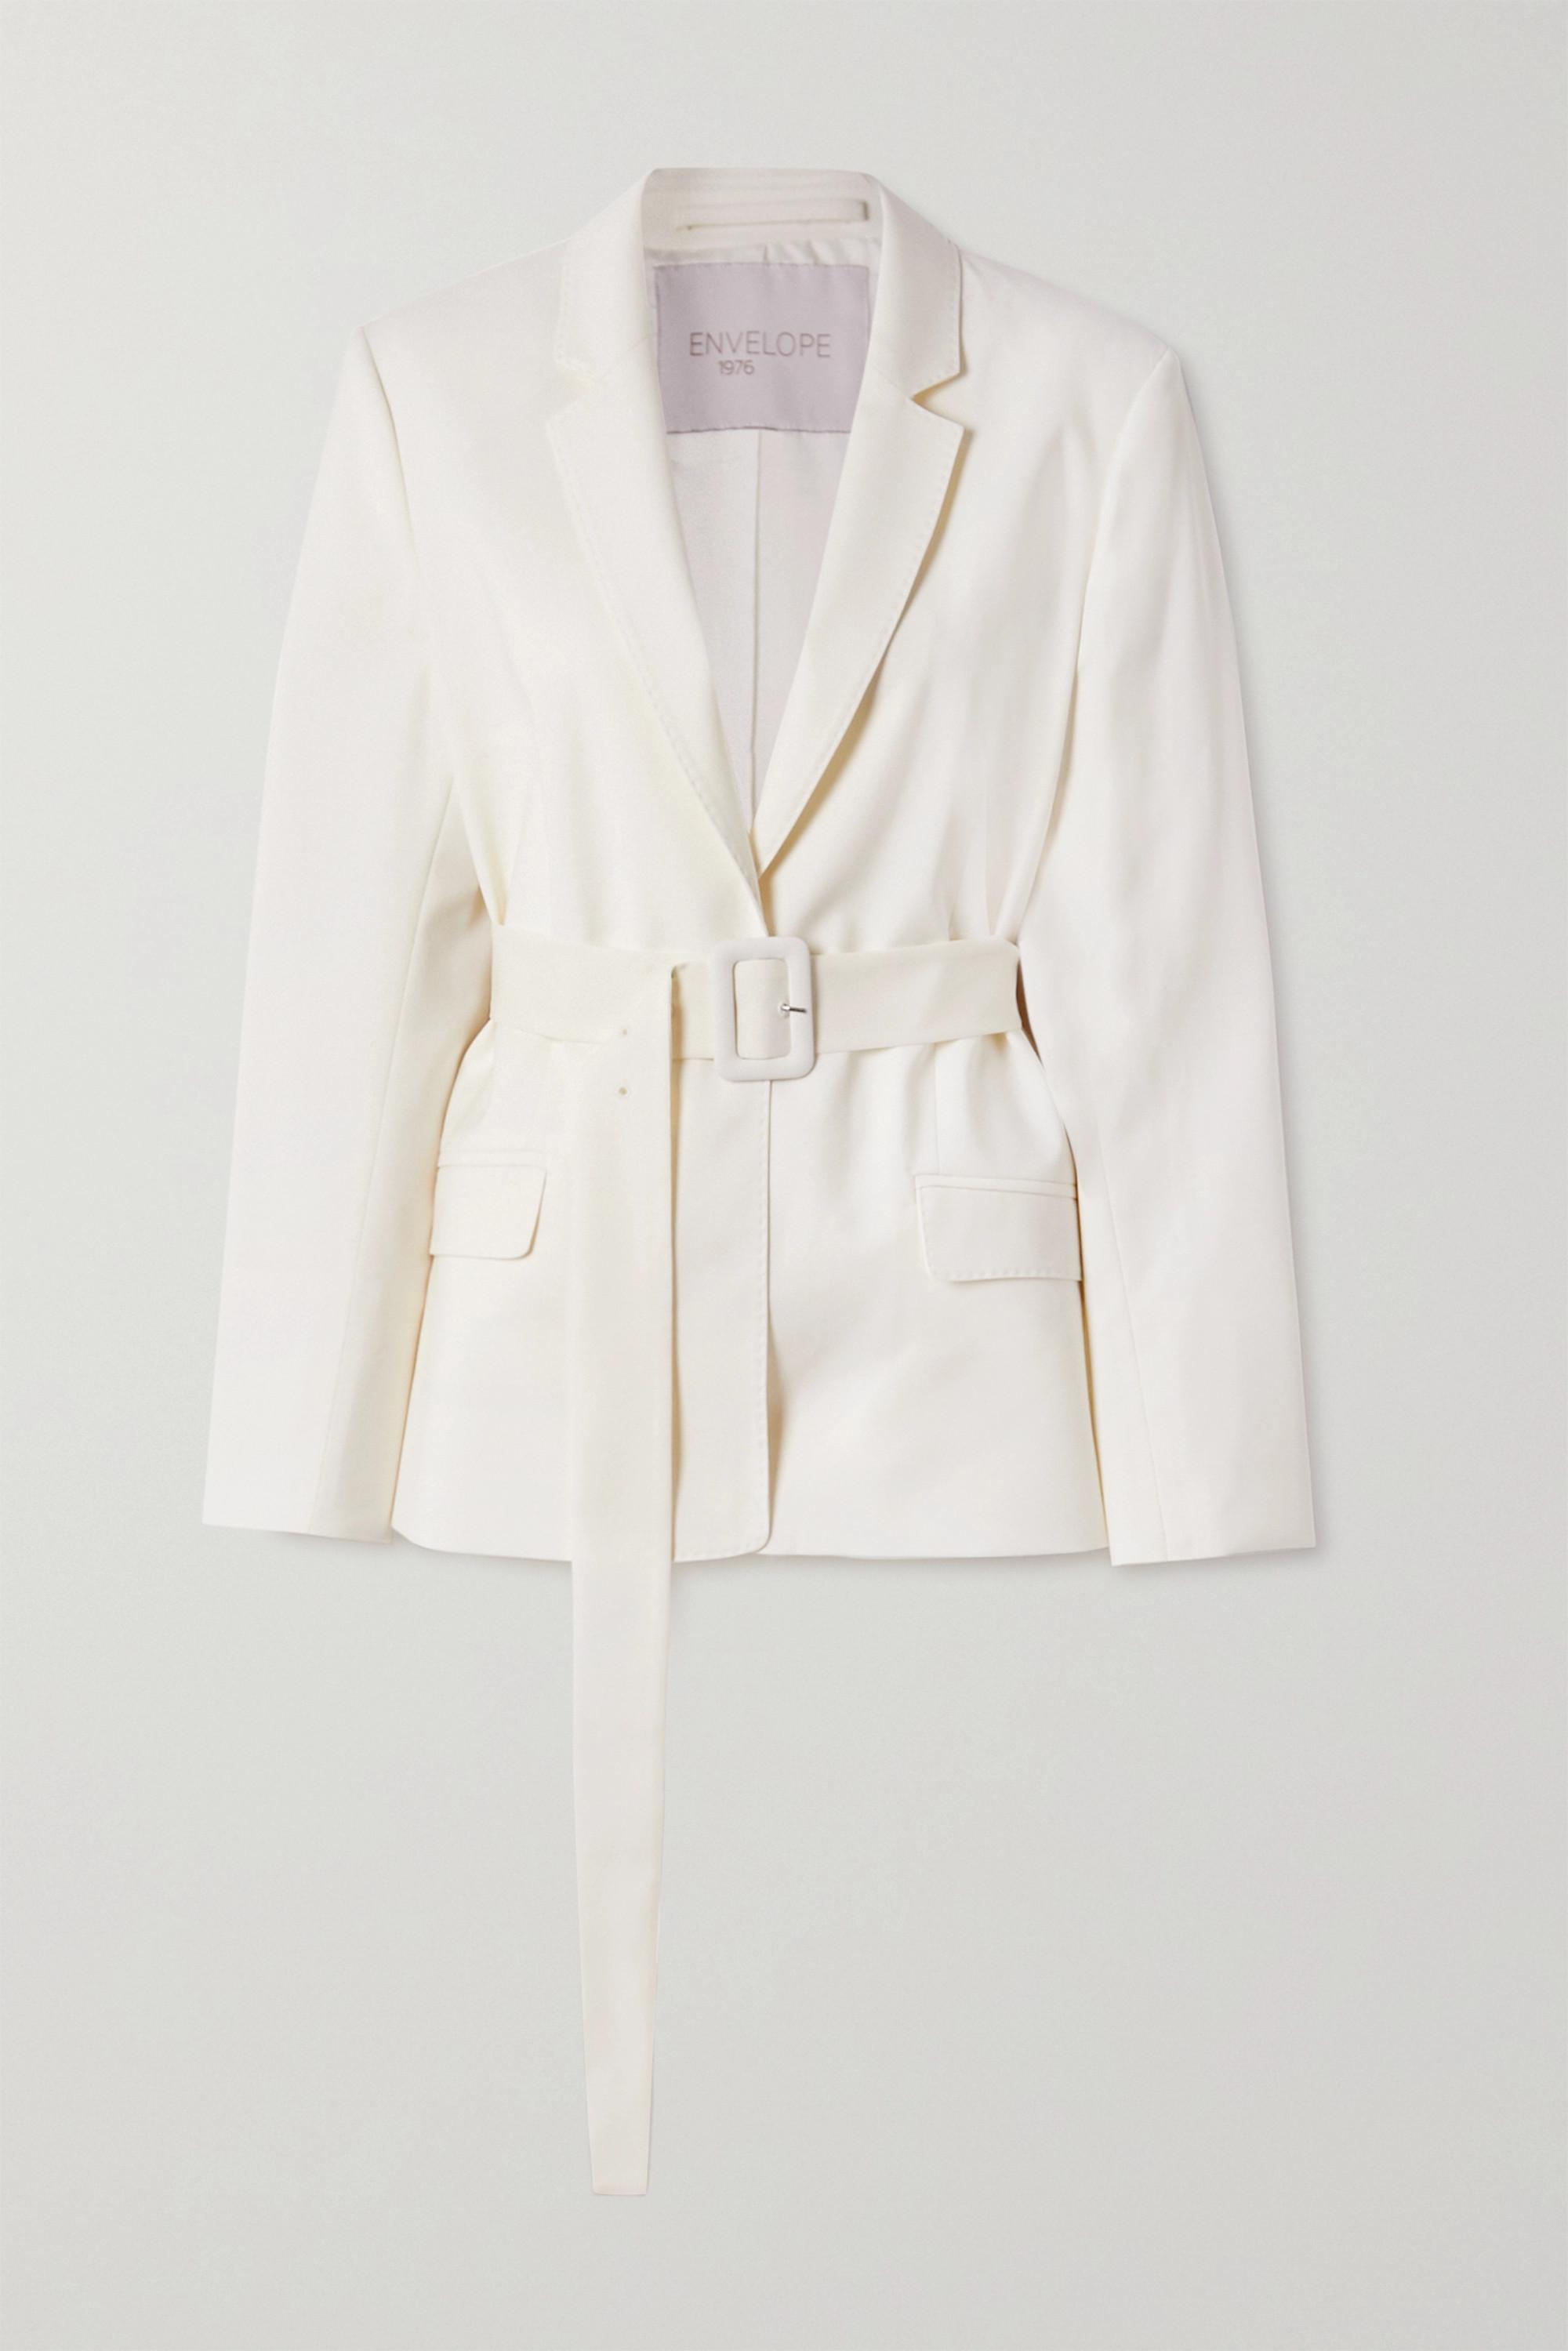 Envelope1976 + NET SUSTAIN Pfeiffer belted wool-crepe blazer